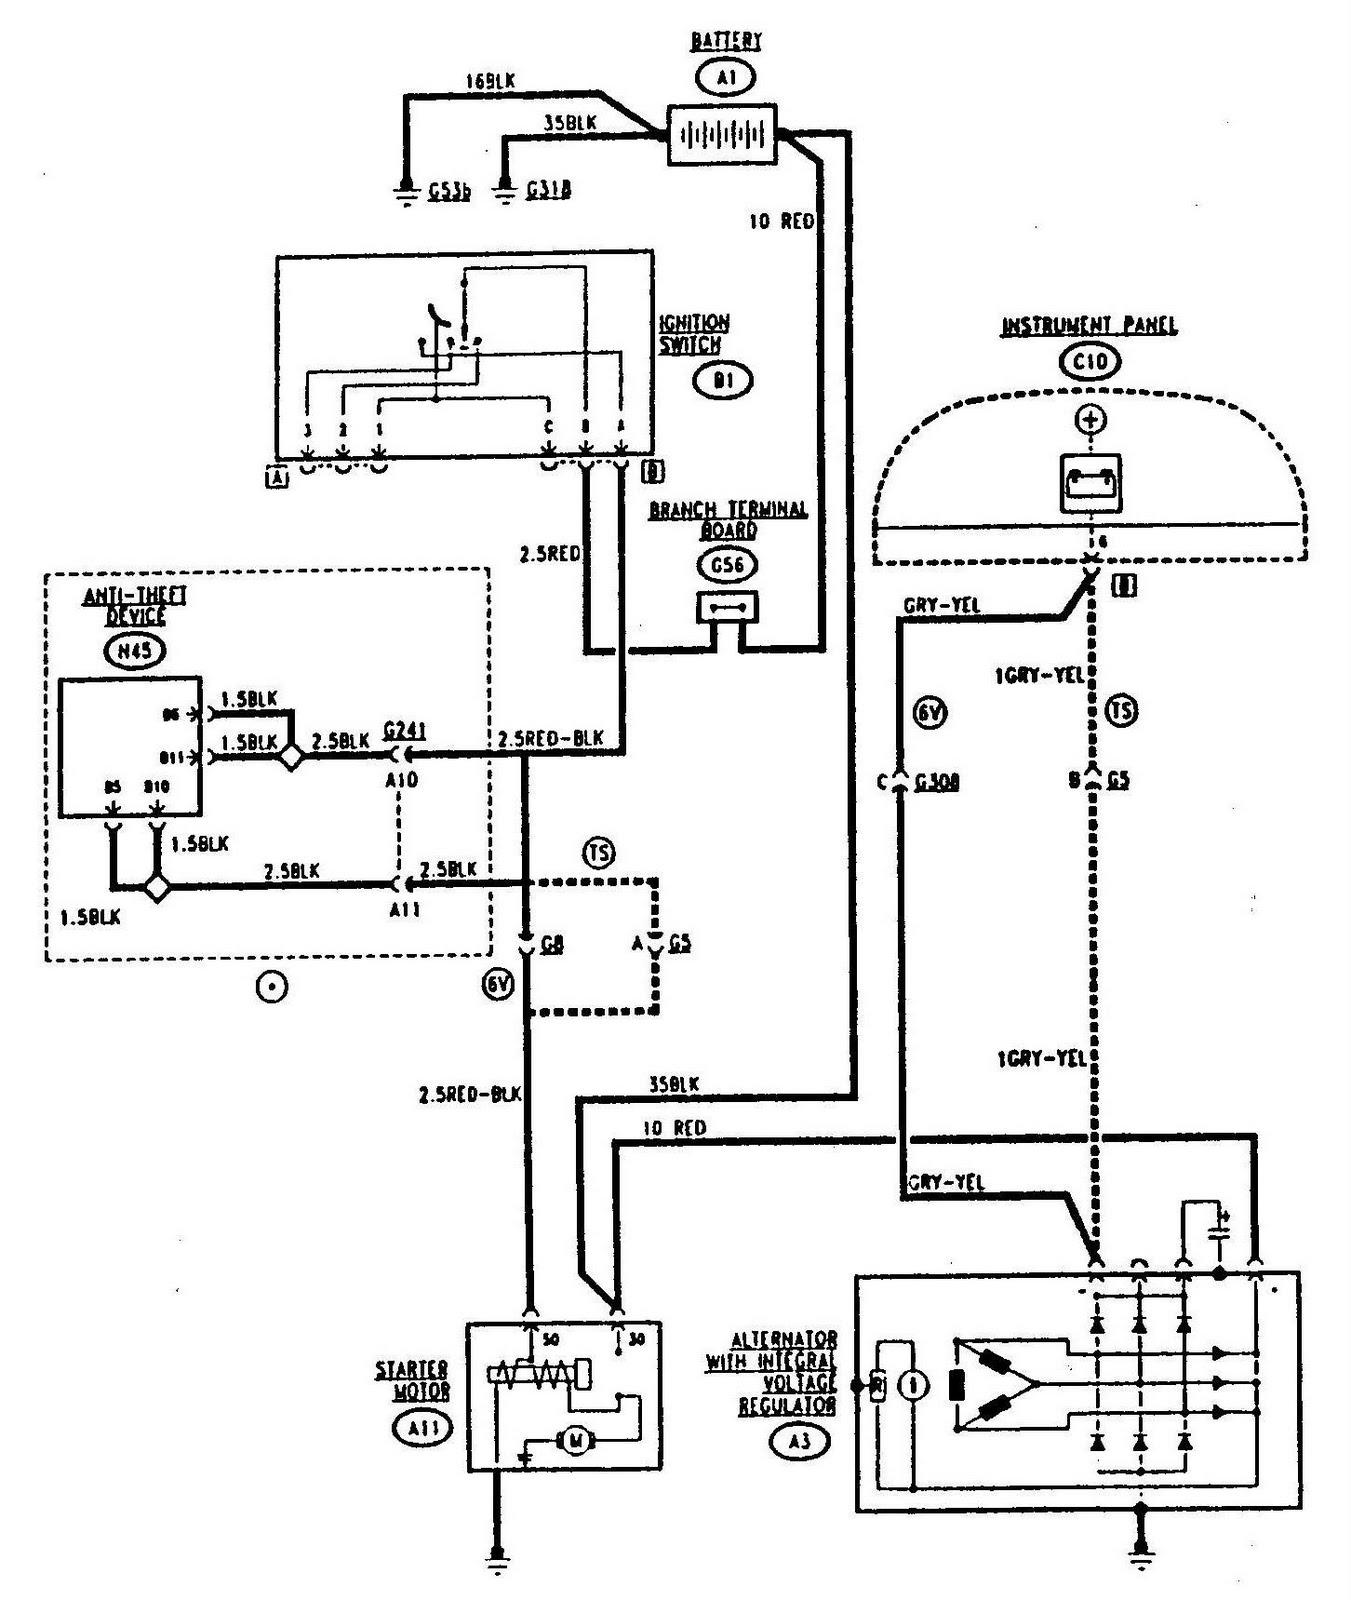 hight resolution of alfa romeo 155 starting and charging circuit diagram